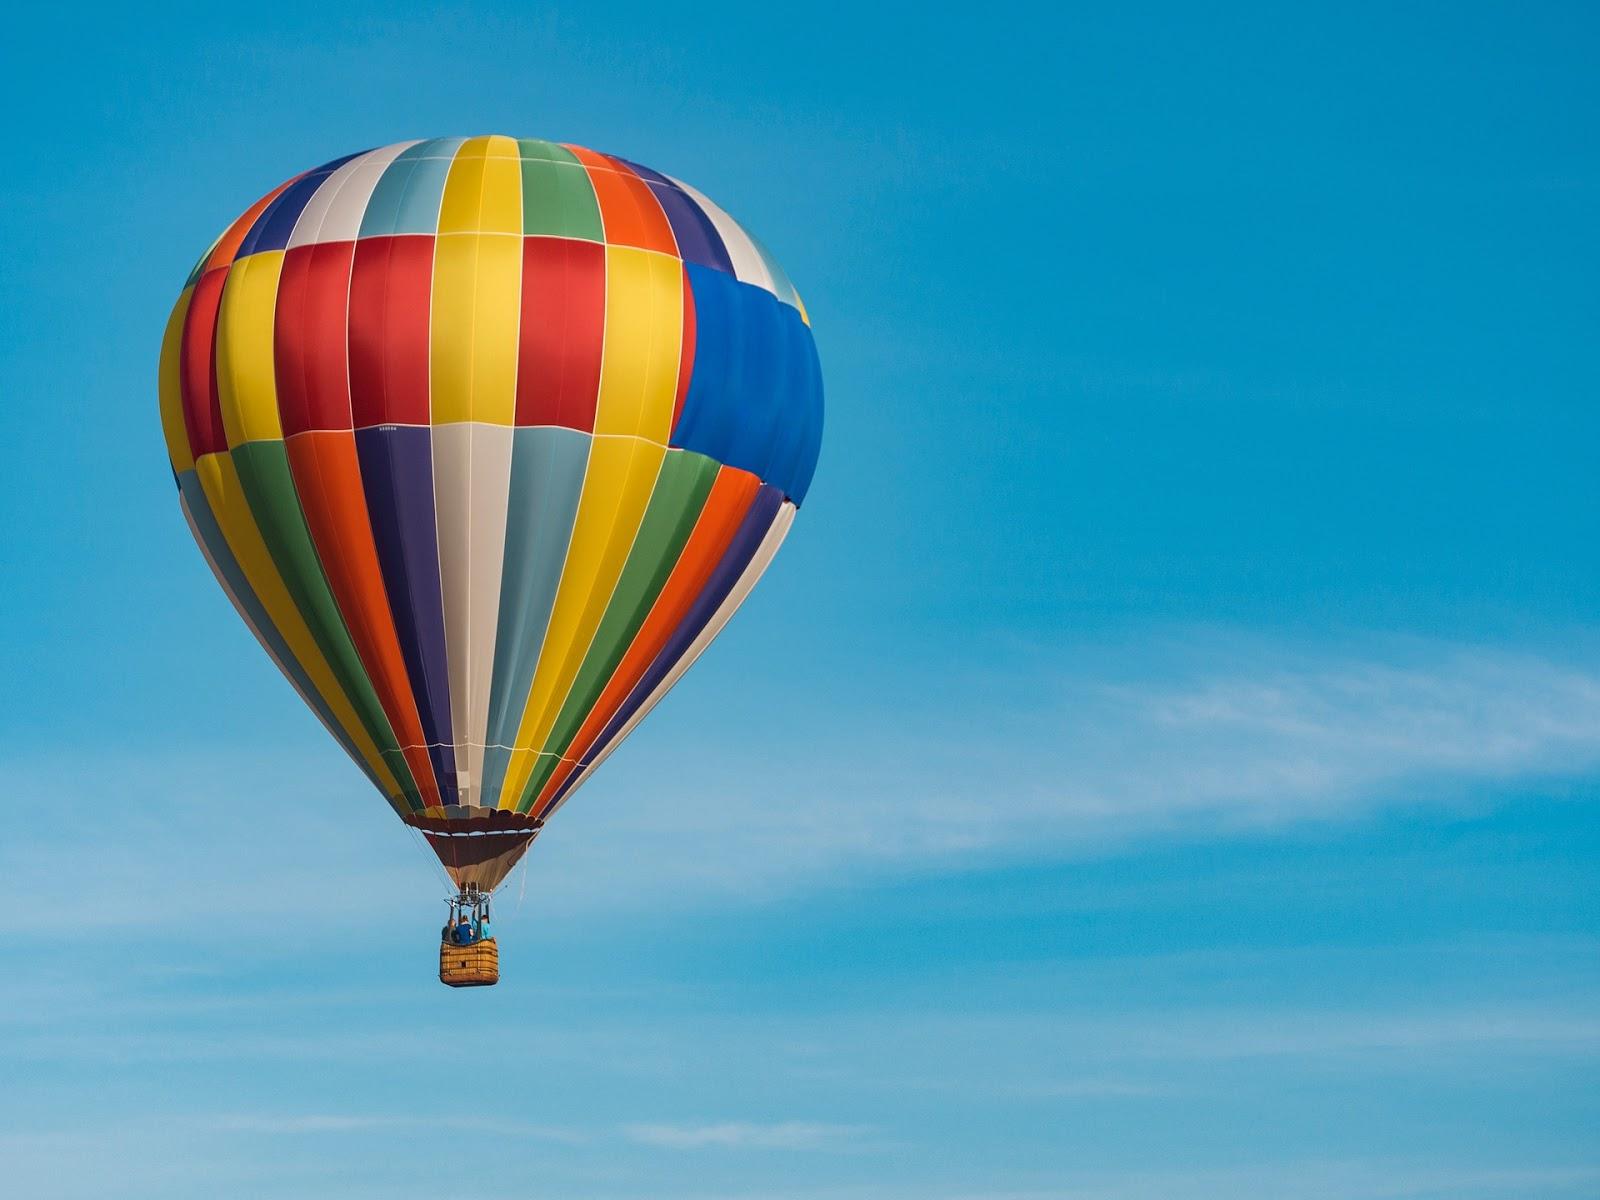 Mengapa Balon Udara Dapat Terbang? - MEDIA ILMU